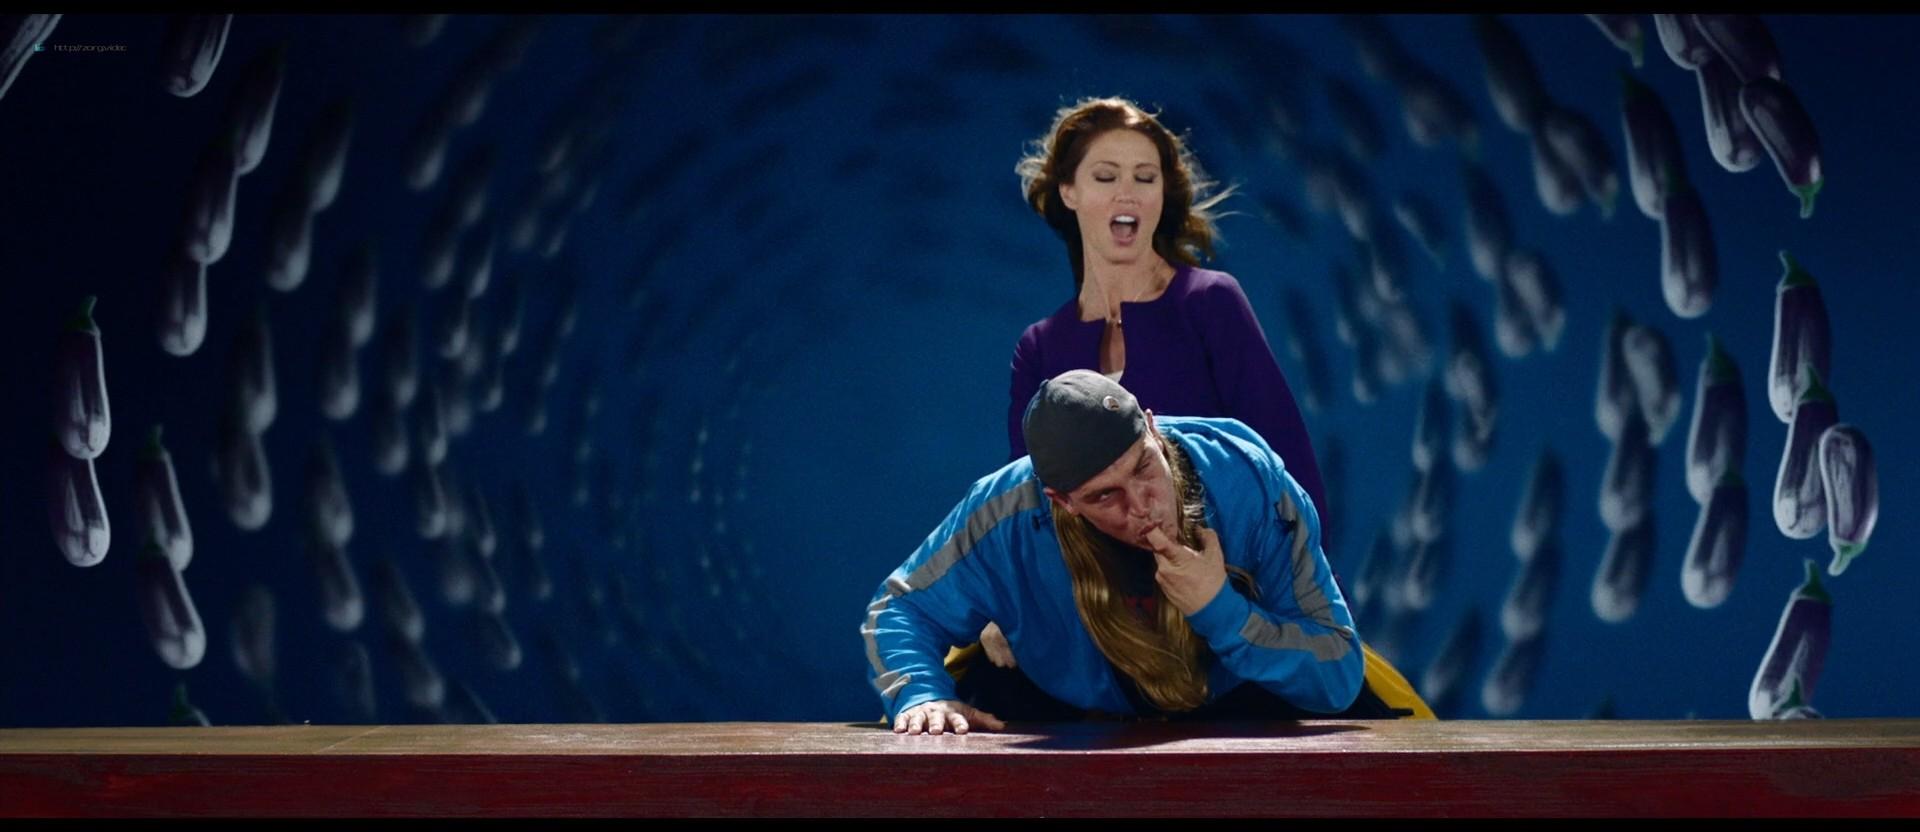 Melissa Benoist hot Shannon Elizabeth sexy - Jay and Silent Bob Reboot (2019) HD 1080p BluRay (13)